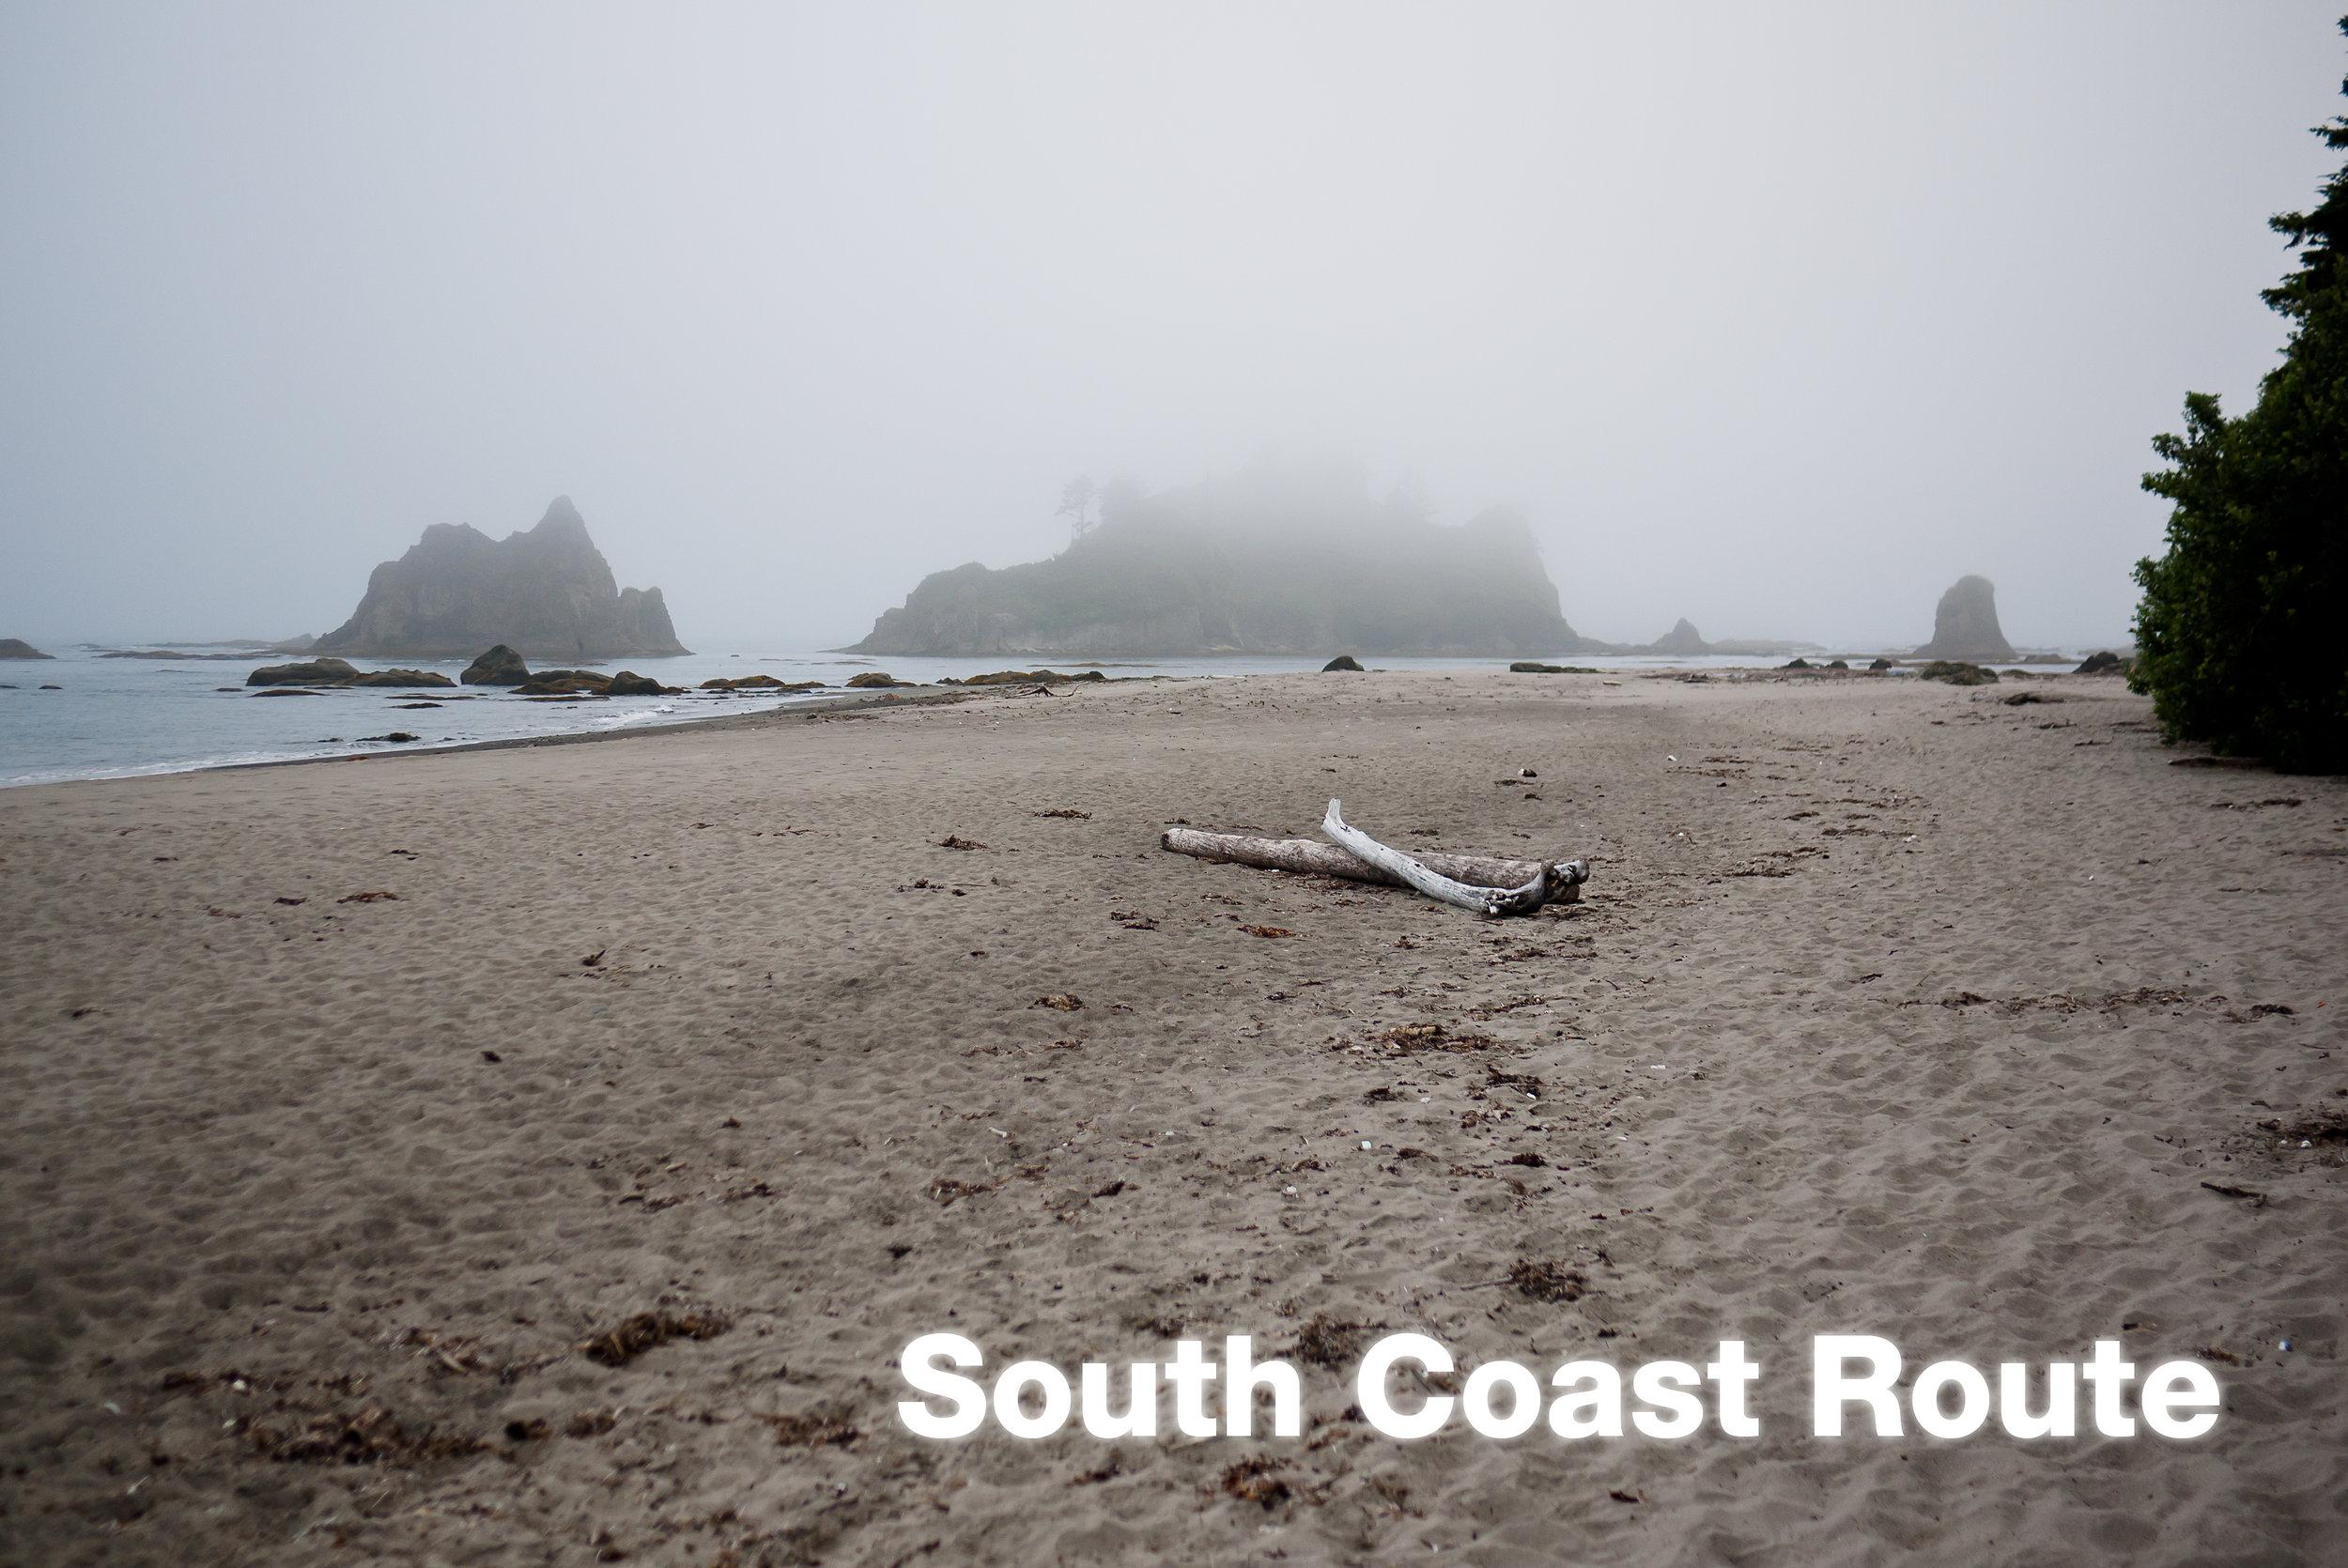 South Coast Route.jpg